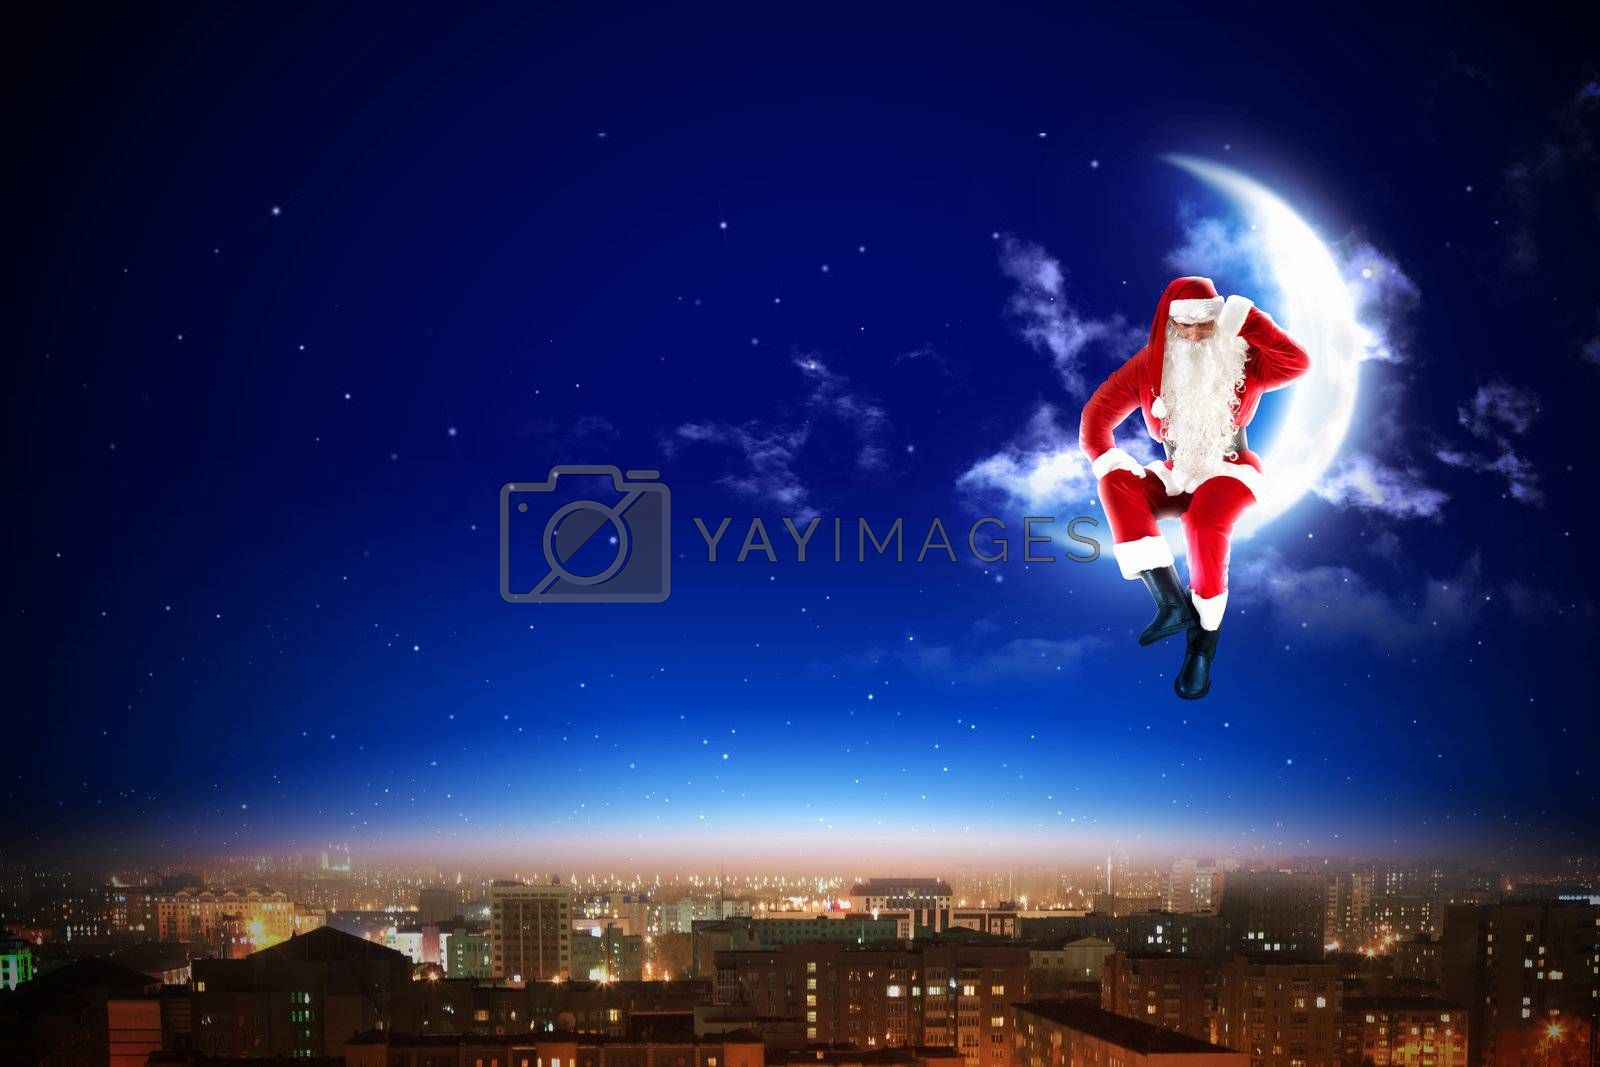 Santa on the moon by Sergey Nivens